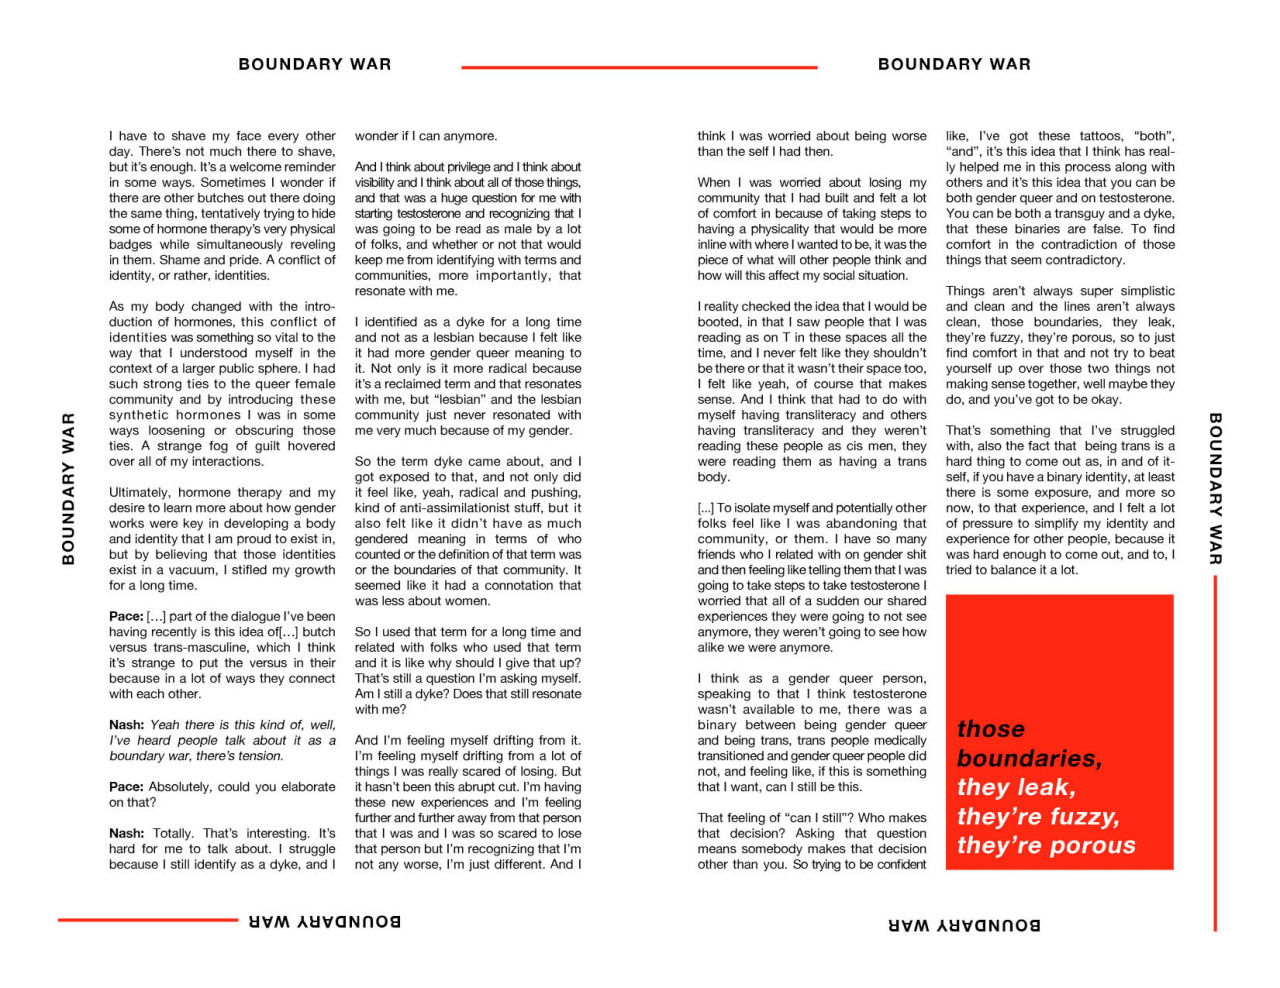 page_14_15.jpg